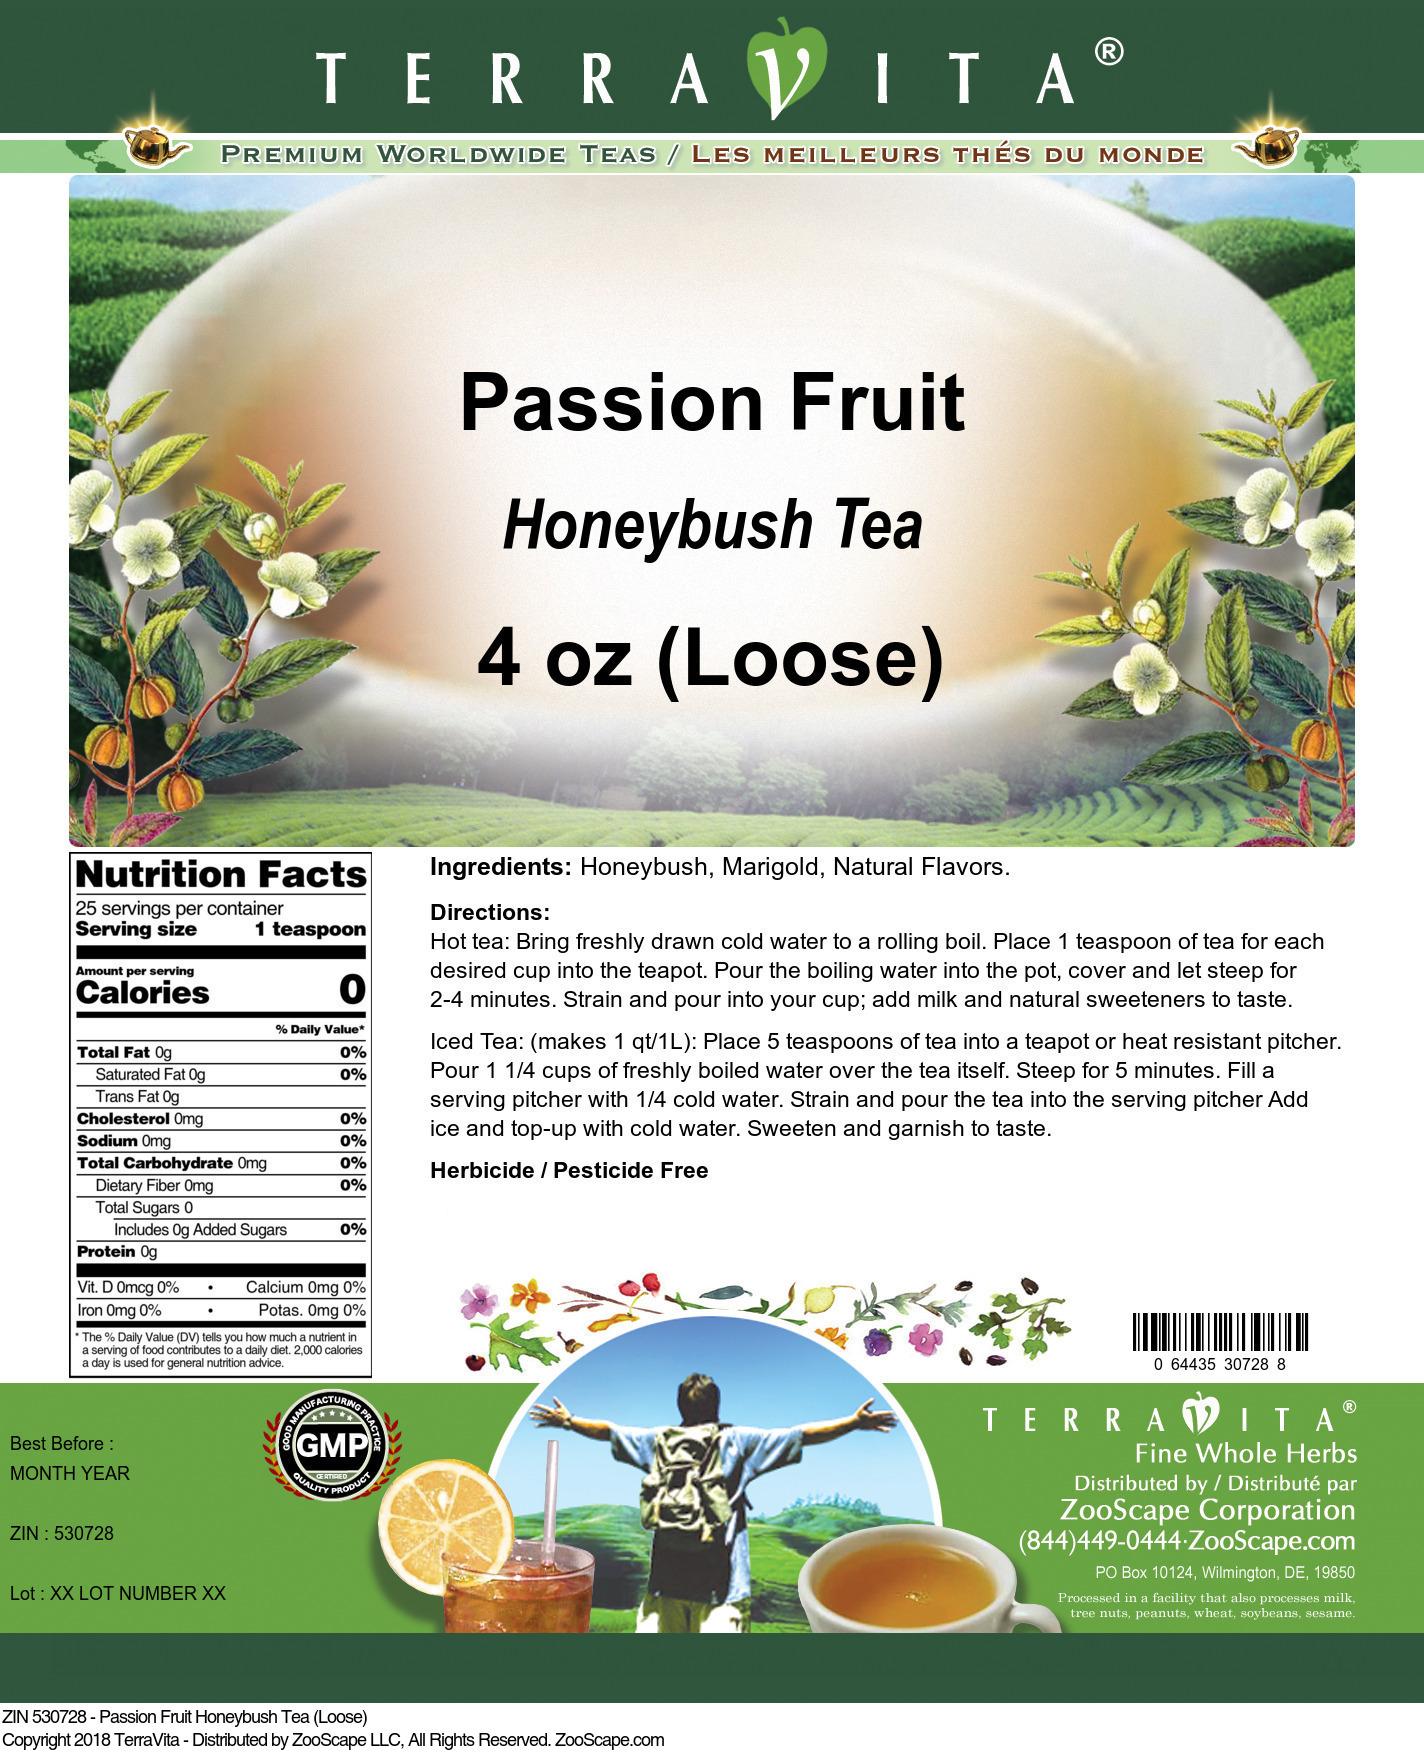 Passion Fruit Honeybush Tea